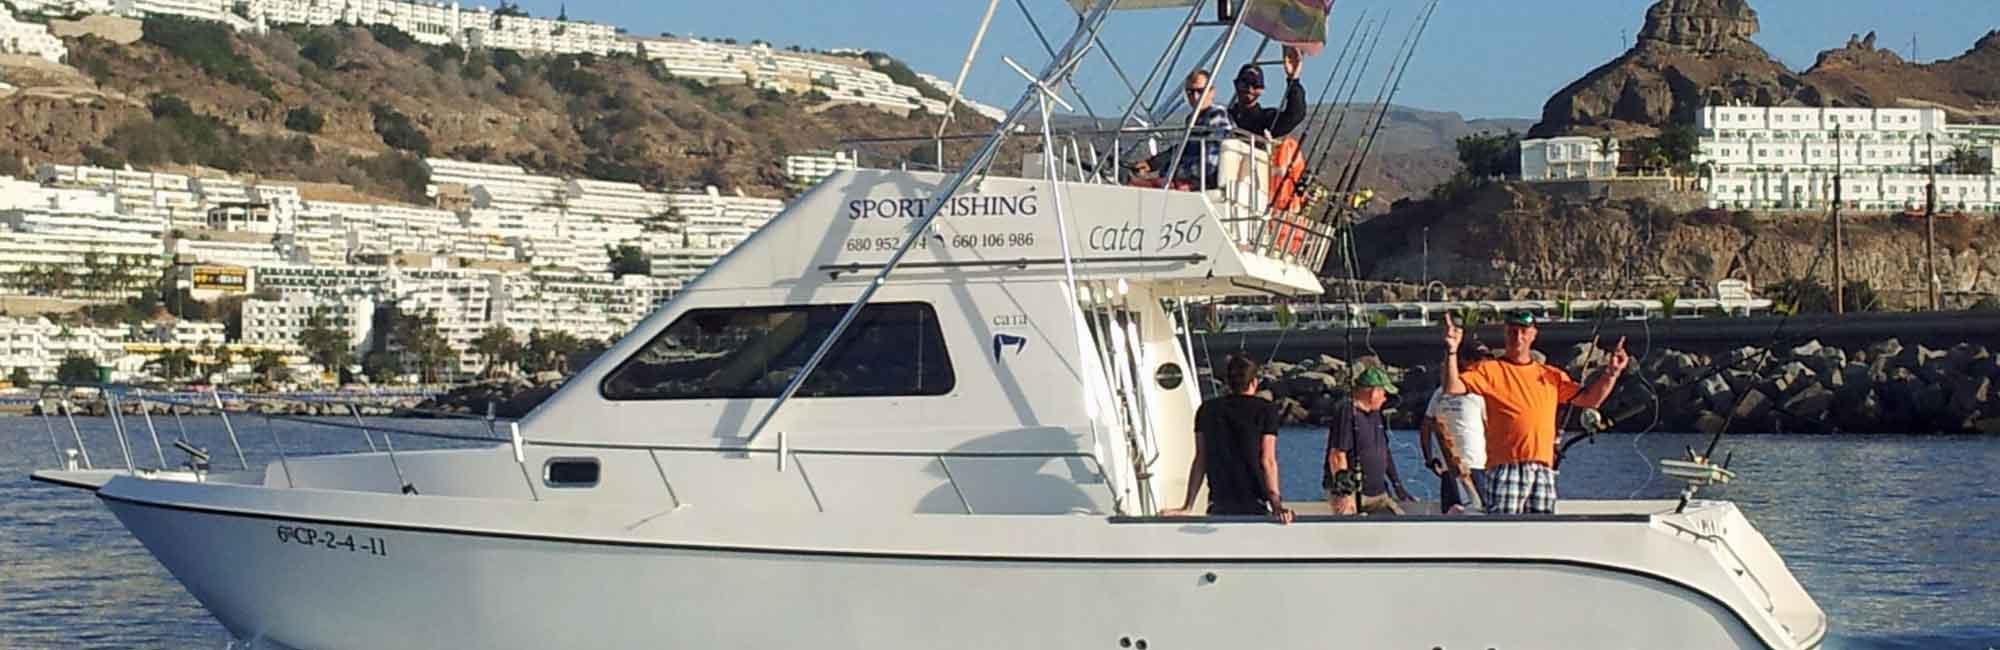 - Cavalier & Blue Marlin Sport Fishing Gran Canaria